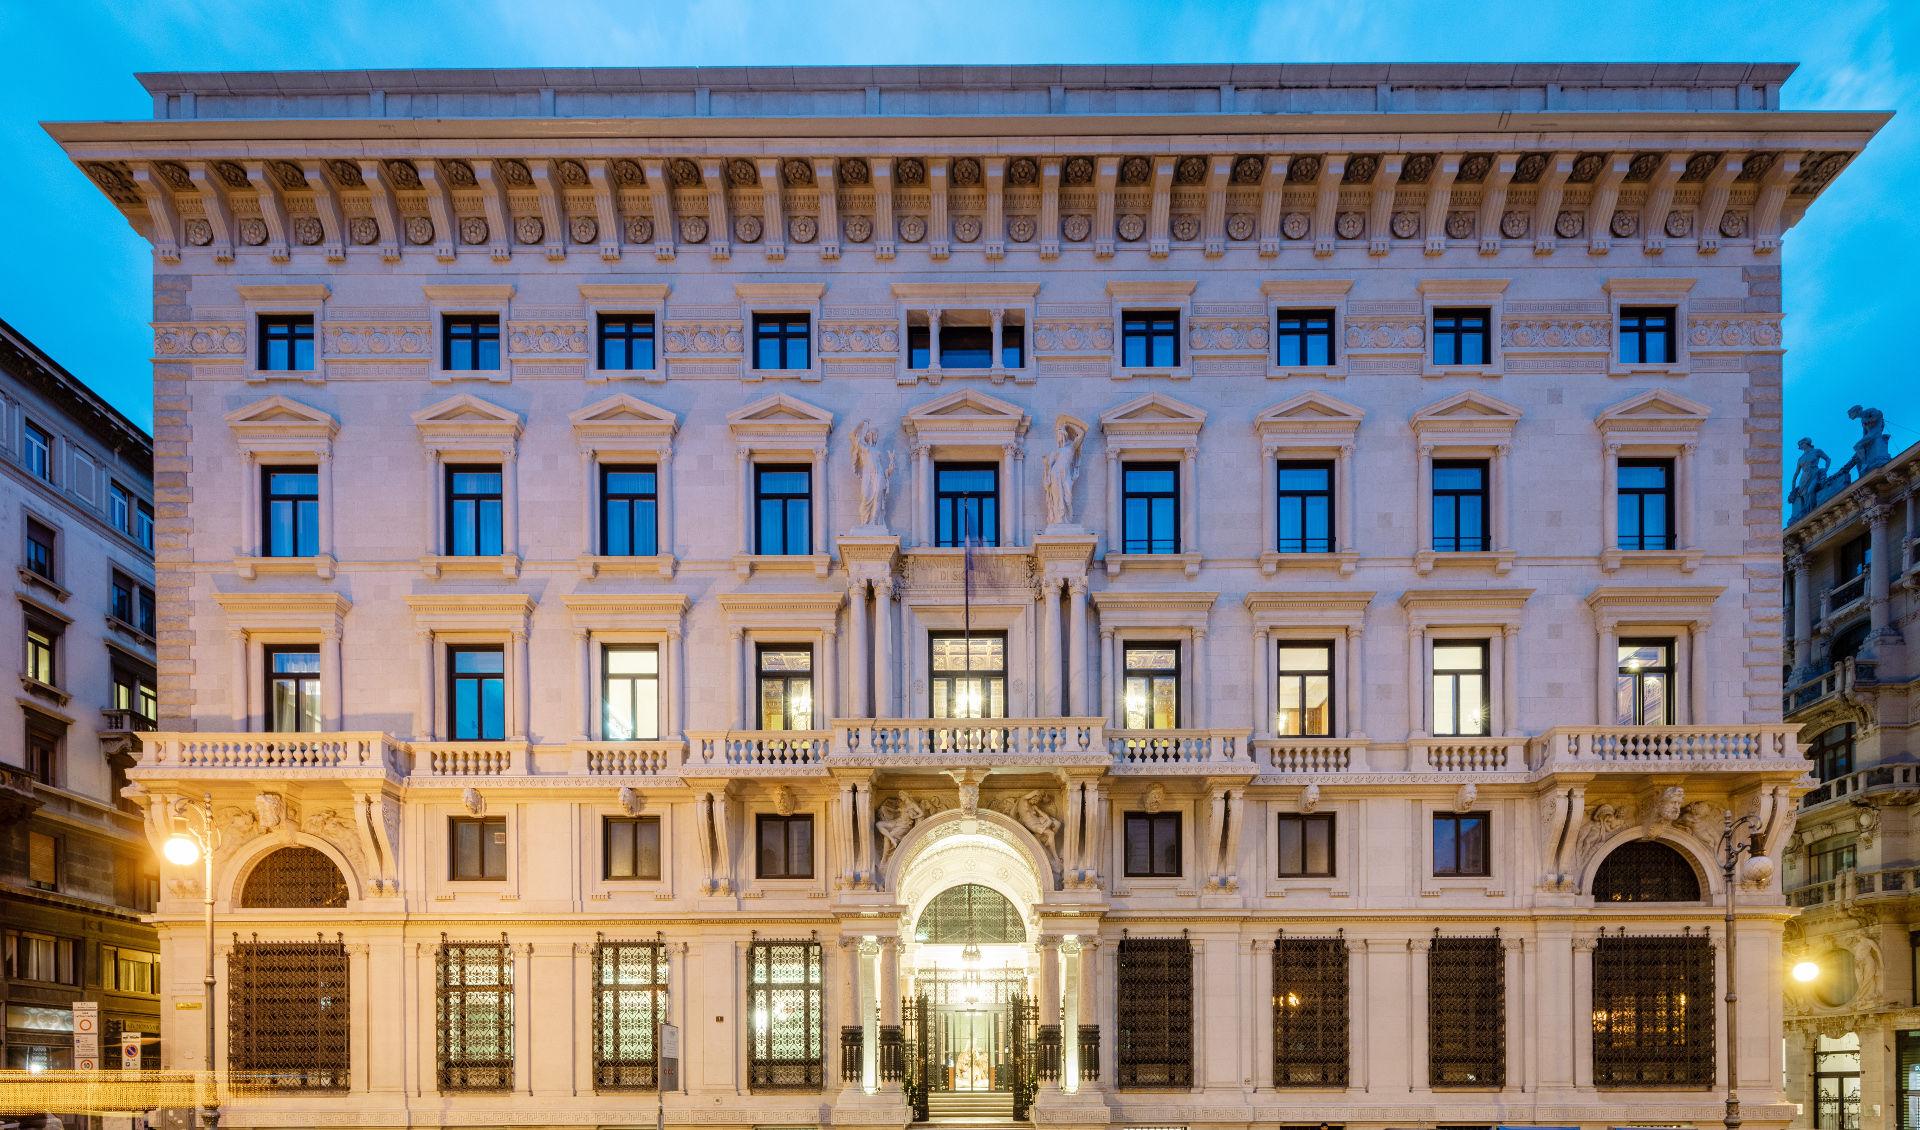 Palazzo ex Ras - Nuovo Hotel Hilton - image 1